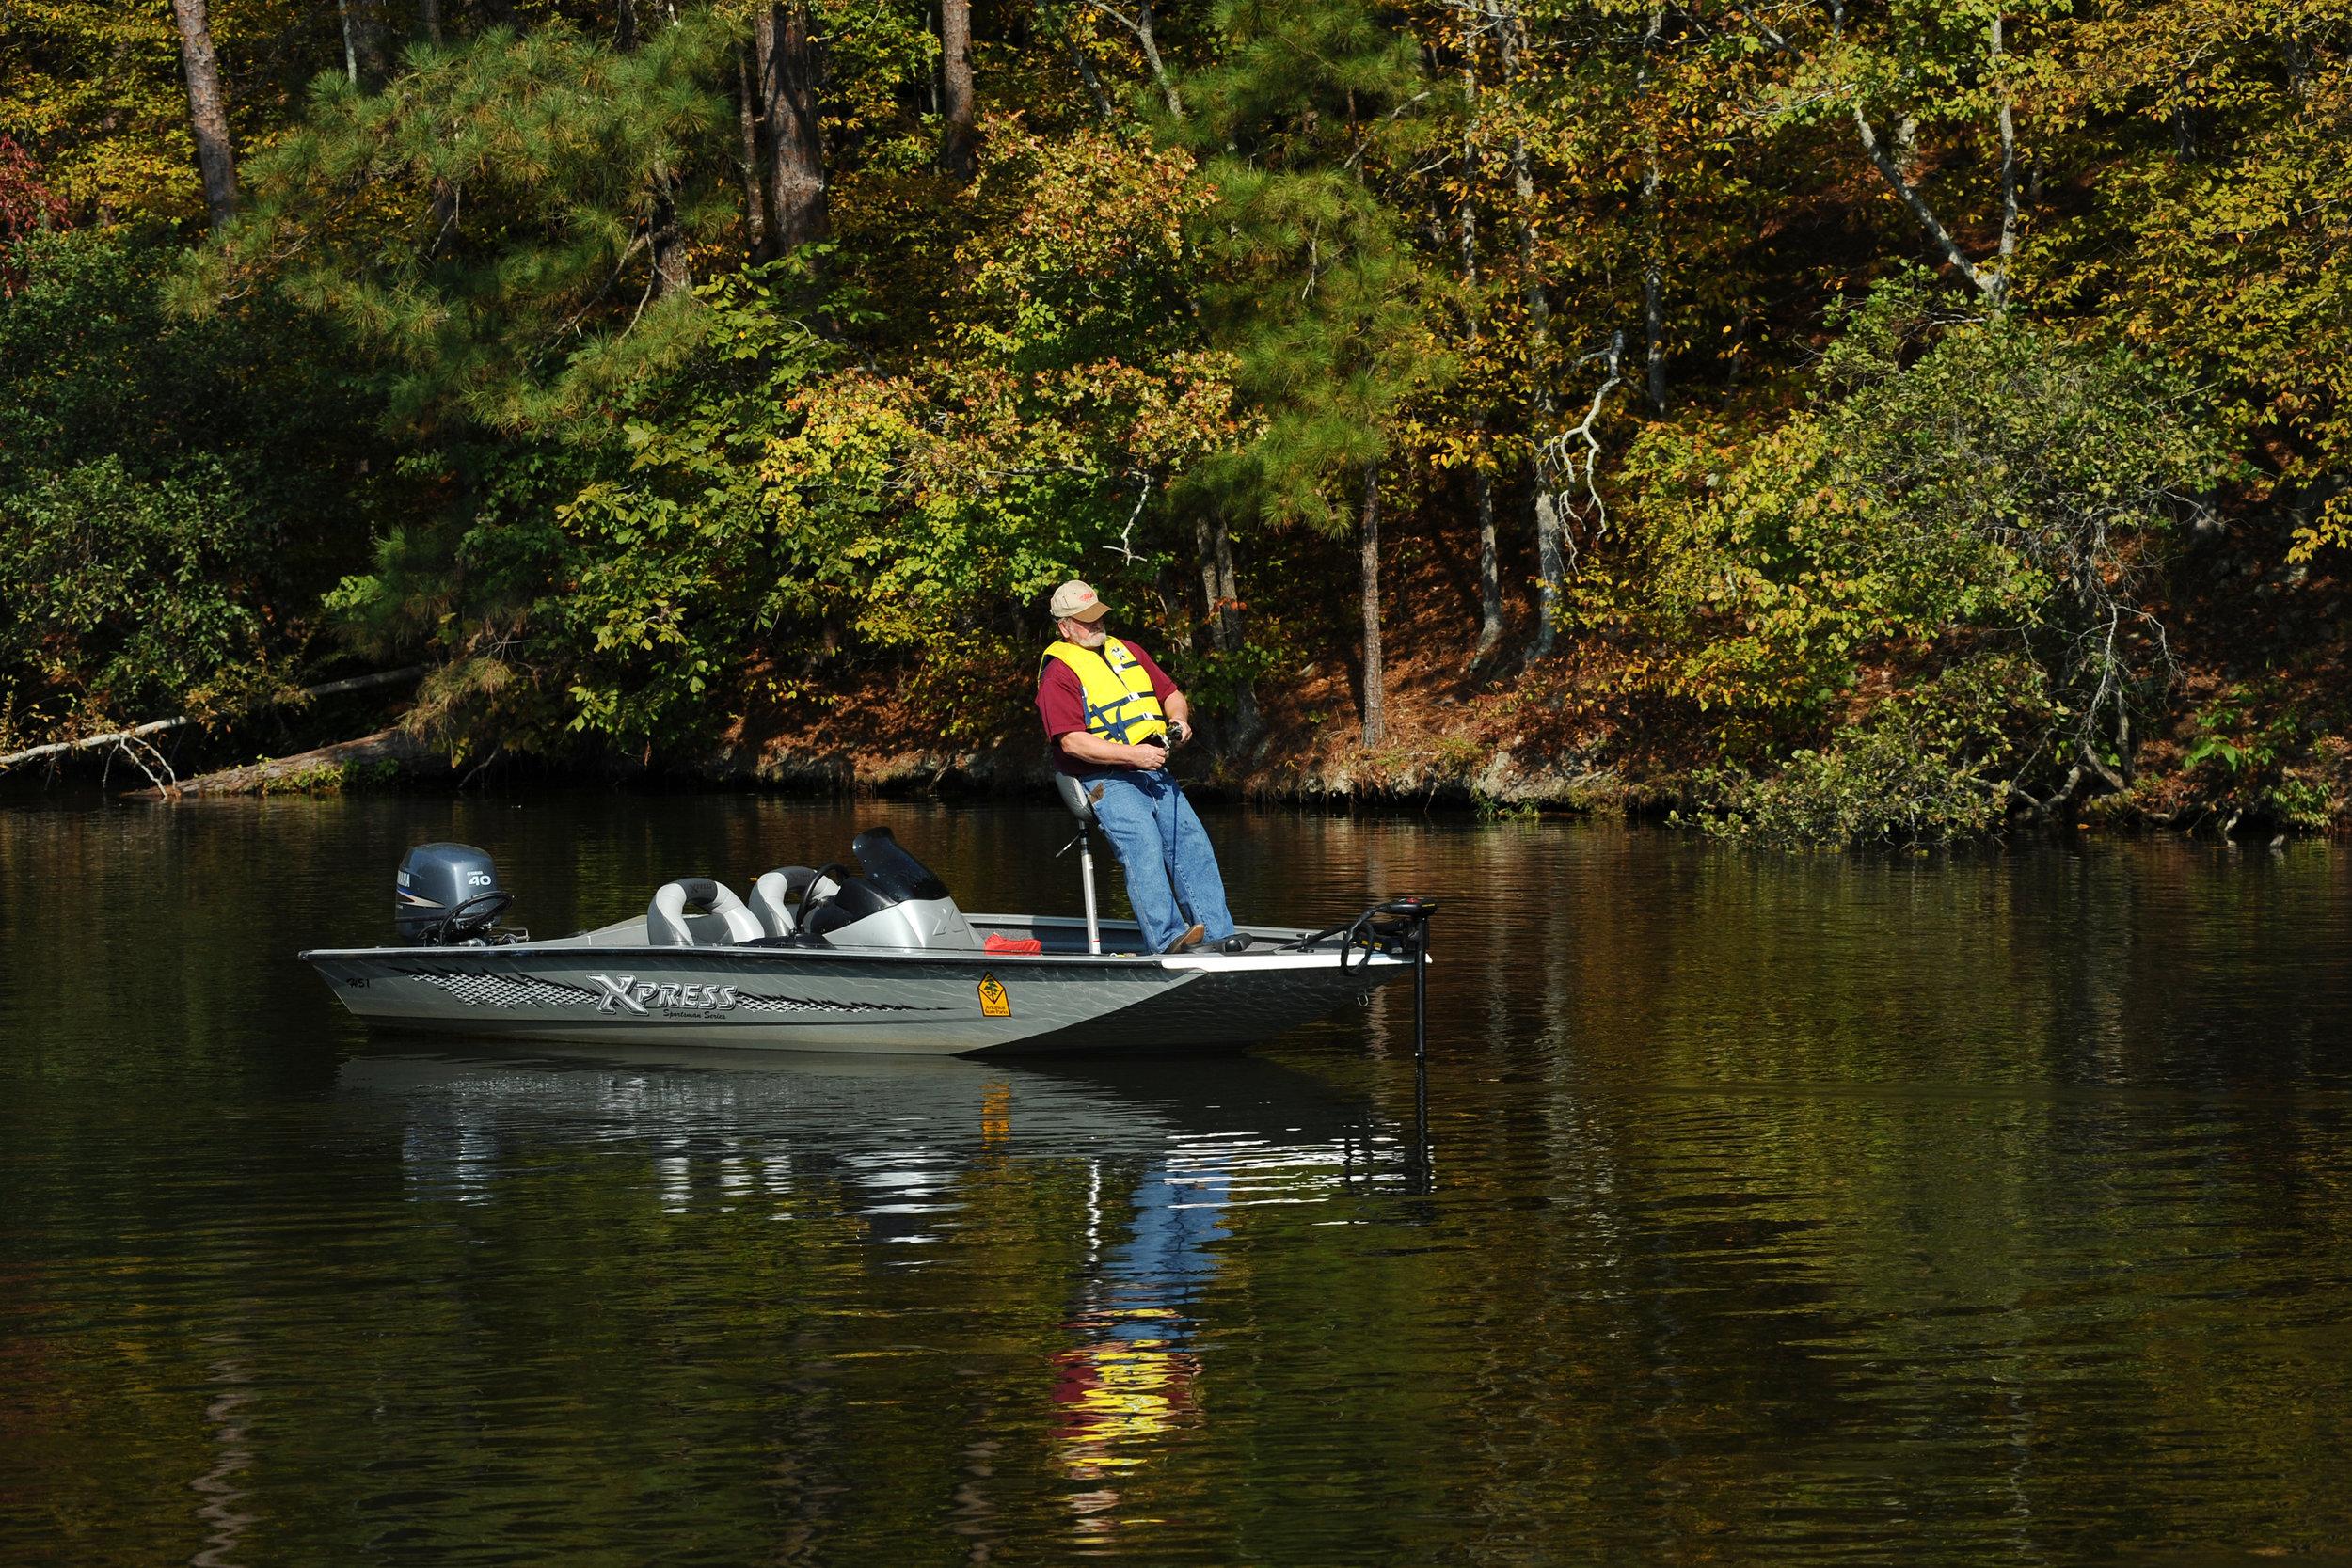 Lake_Catherine_State_Park_Fishing_Hot_Springs_6911.jpg